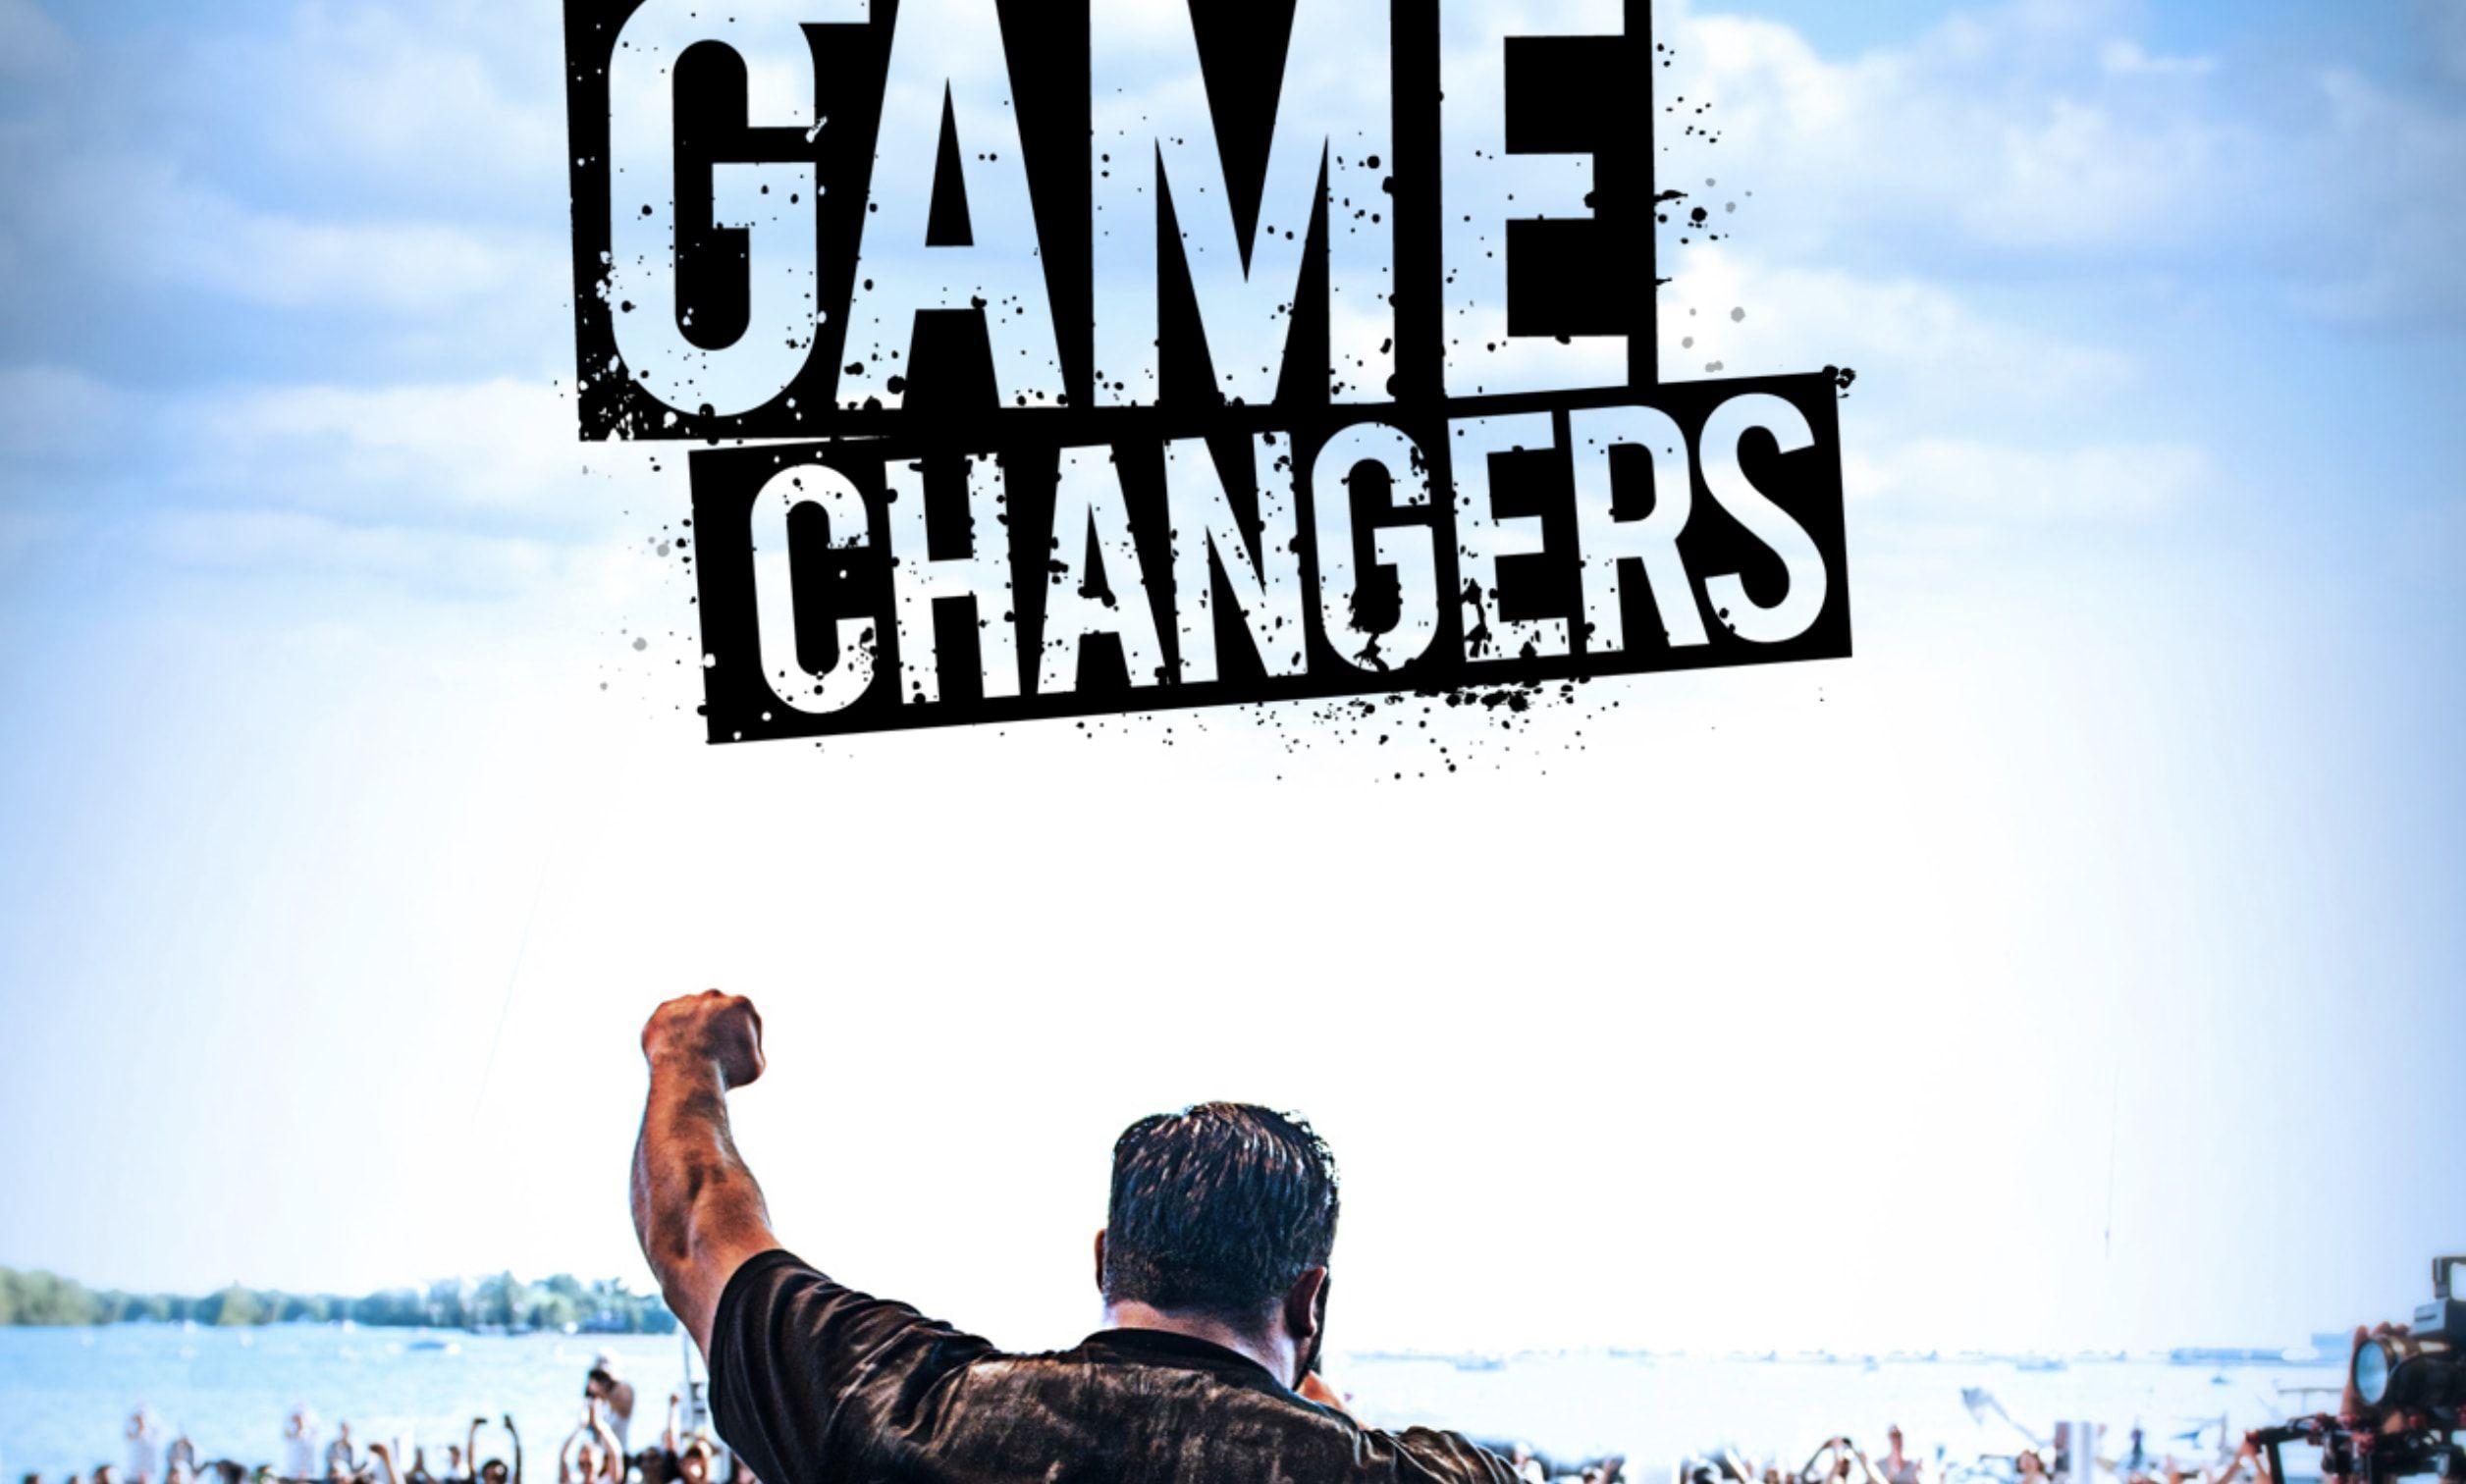 James Cameron S Vegan Film The Game Changers Debut Described As Electric Https Www Plantbasednews Org Documentaries Sundance Film Festival Game Changer